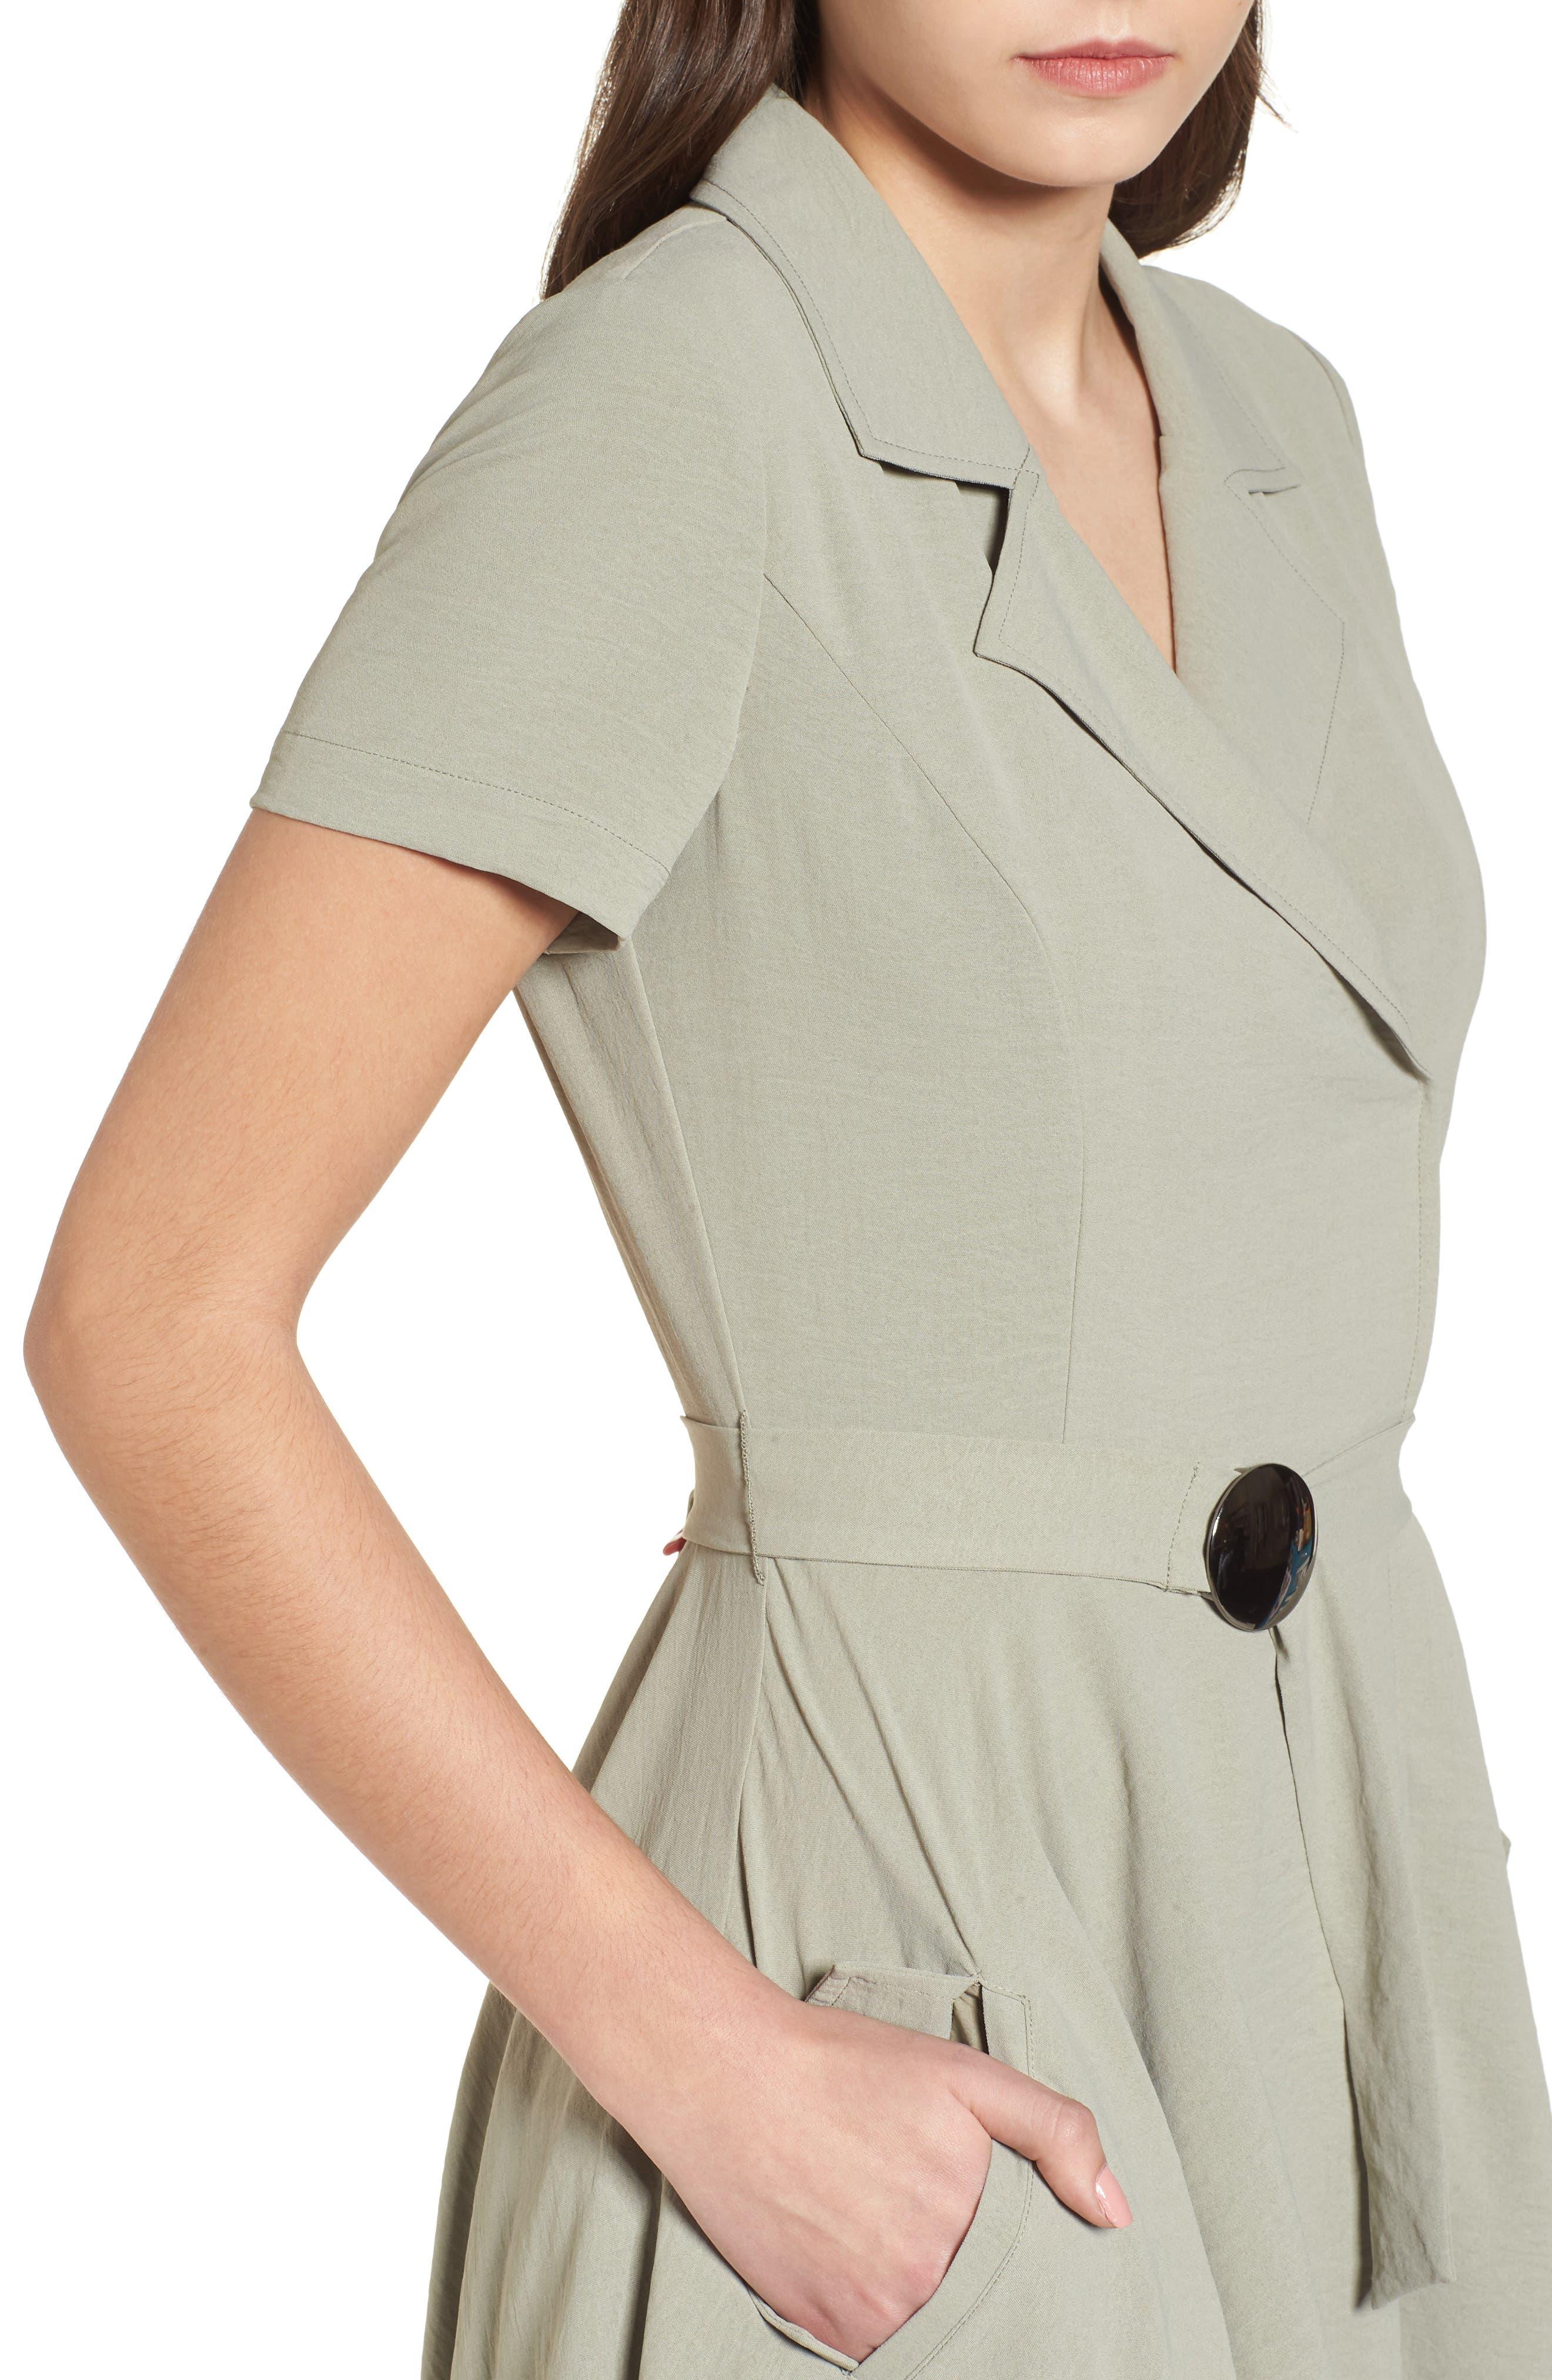 Chriselle x J.O.A. Asymmetrical Trench Dress,                             Alternate thumbnail 5, color,                             300